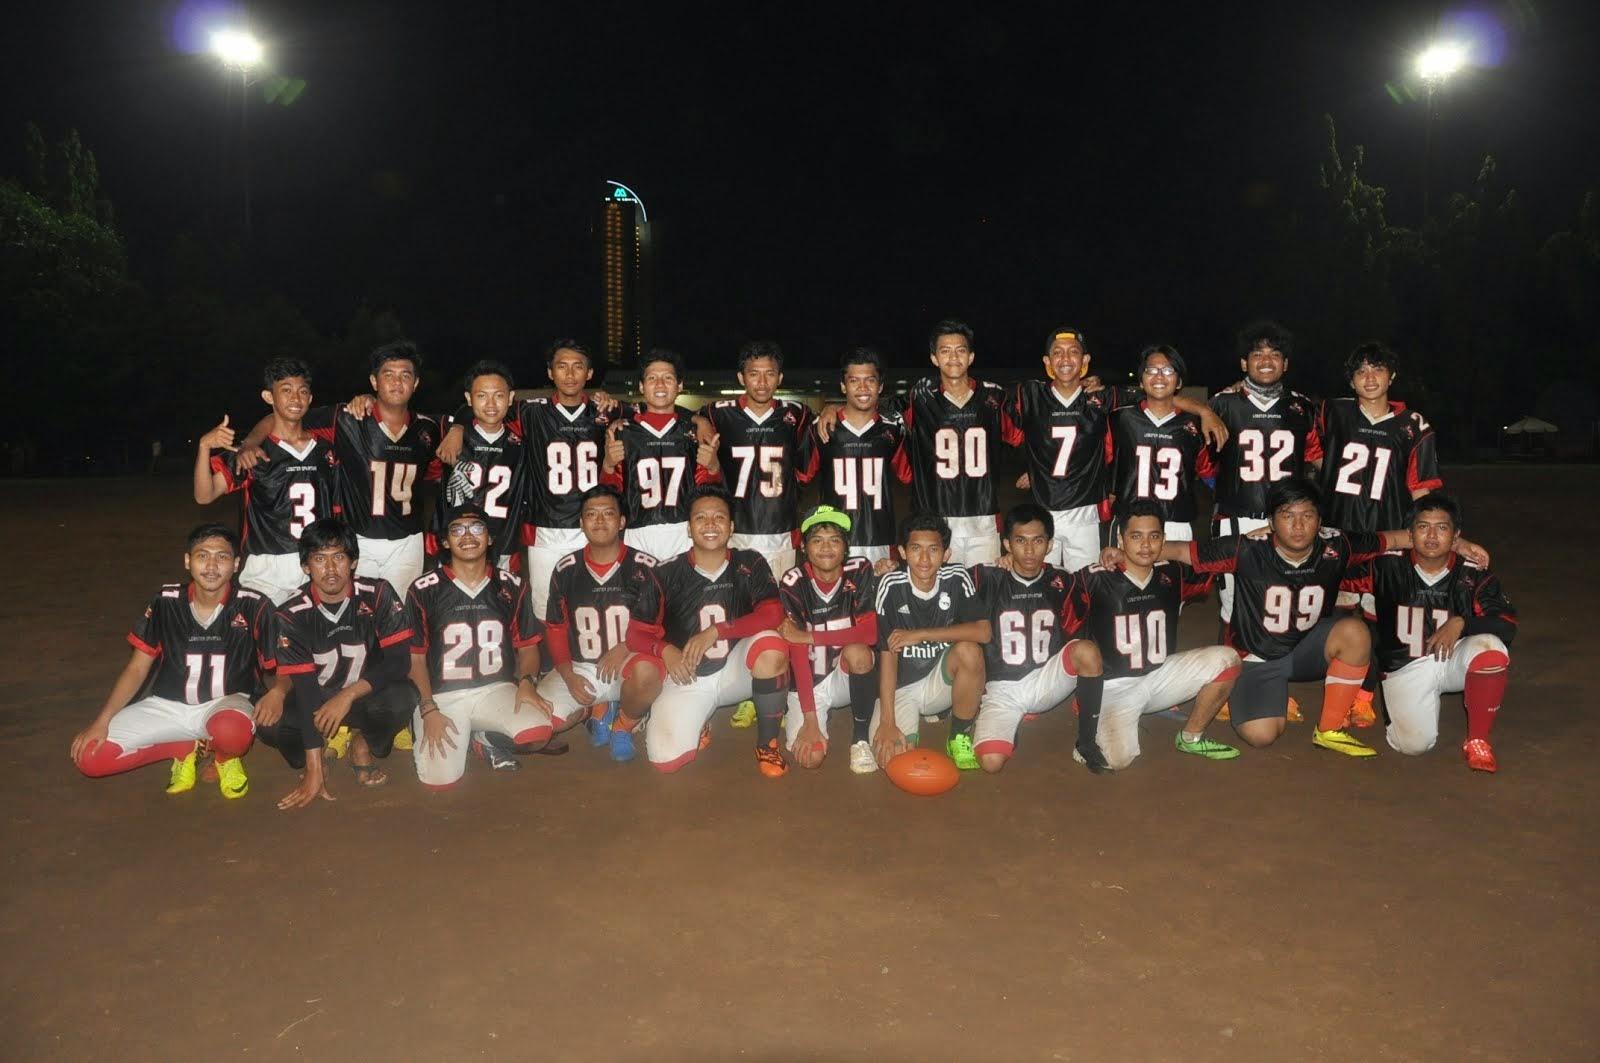 Merdeka Bowl 2 2015